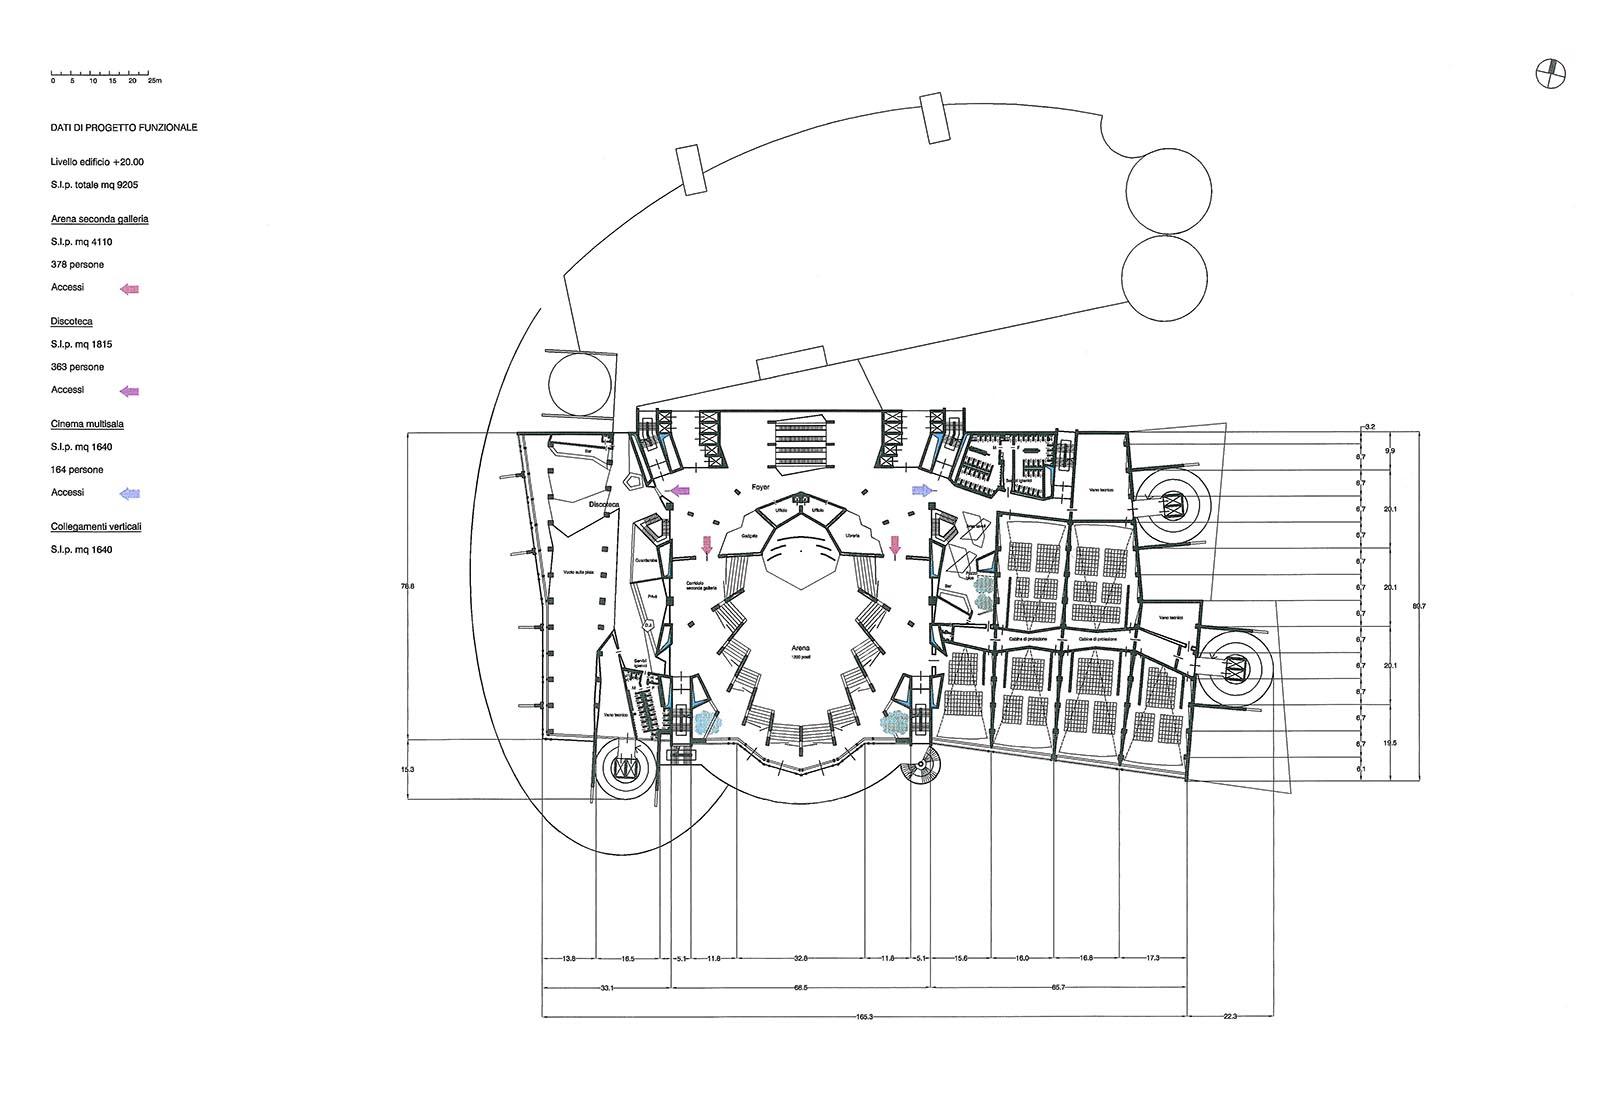 Leisure center a Rho - Pianta piano terzo